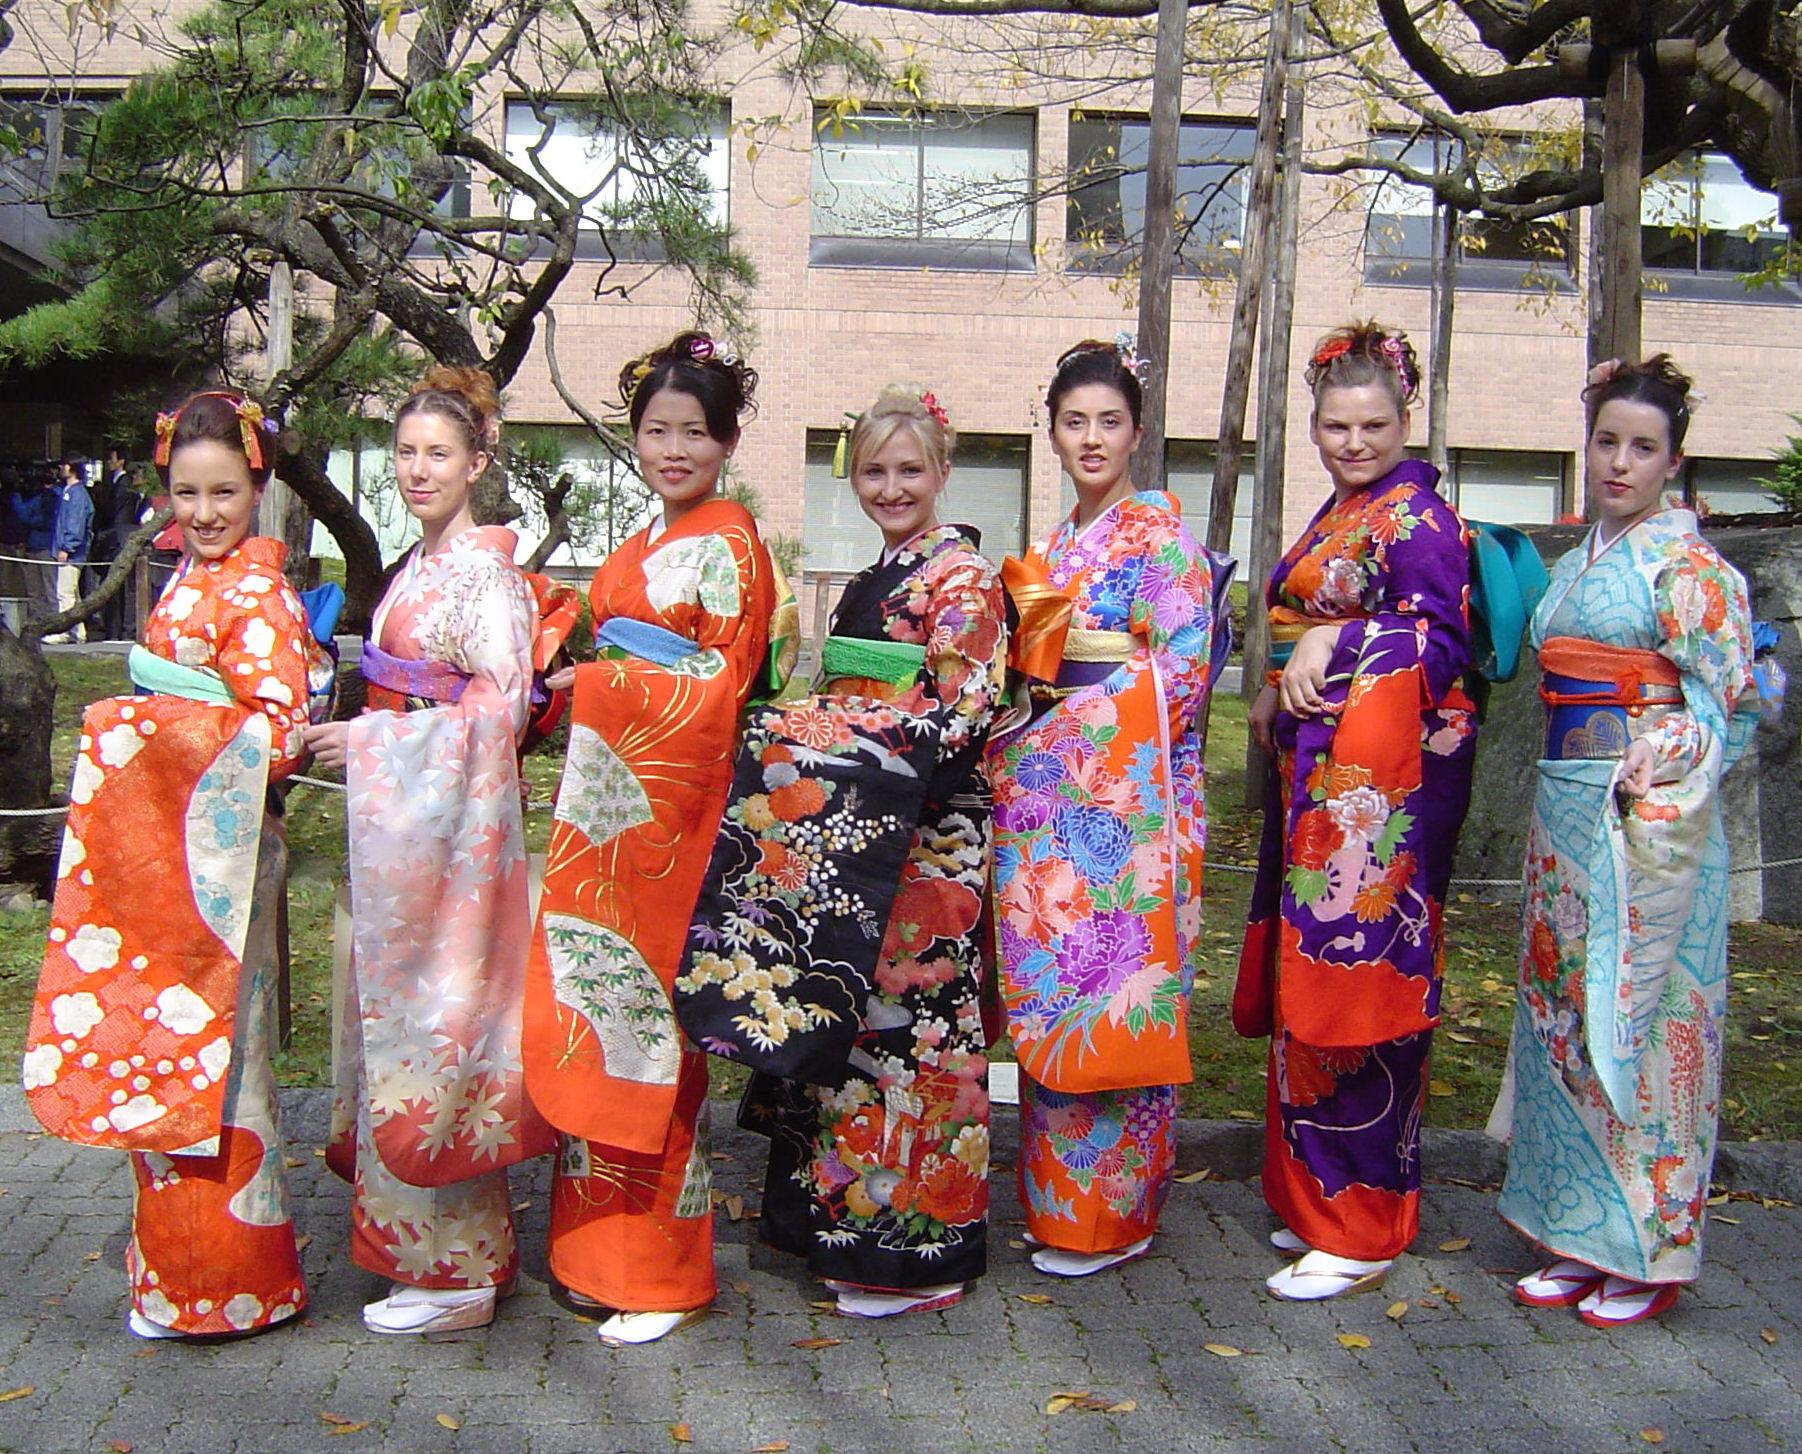 15 Unique Aspects Of Japanese Culture